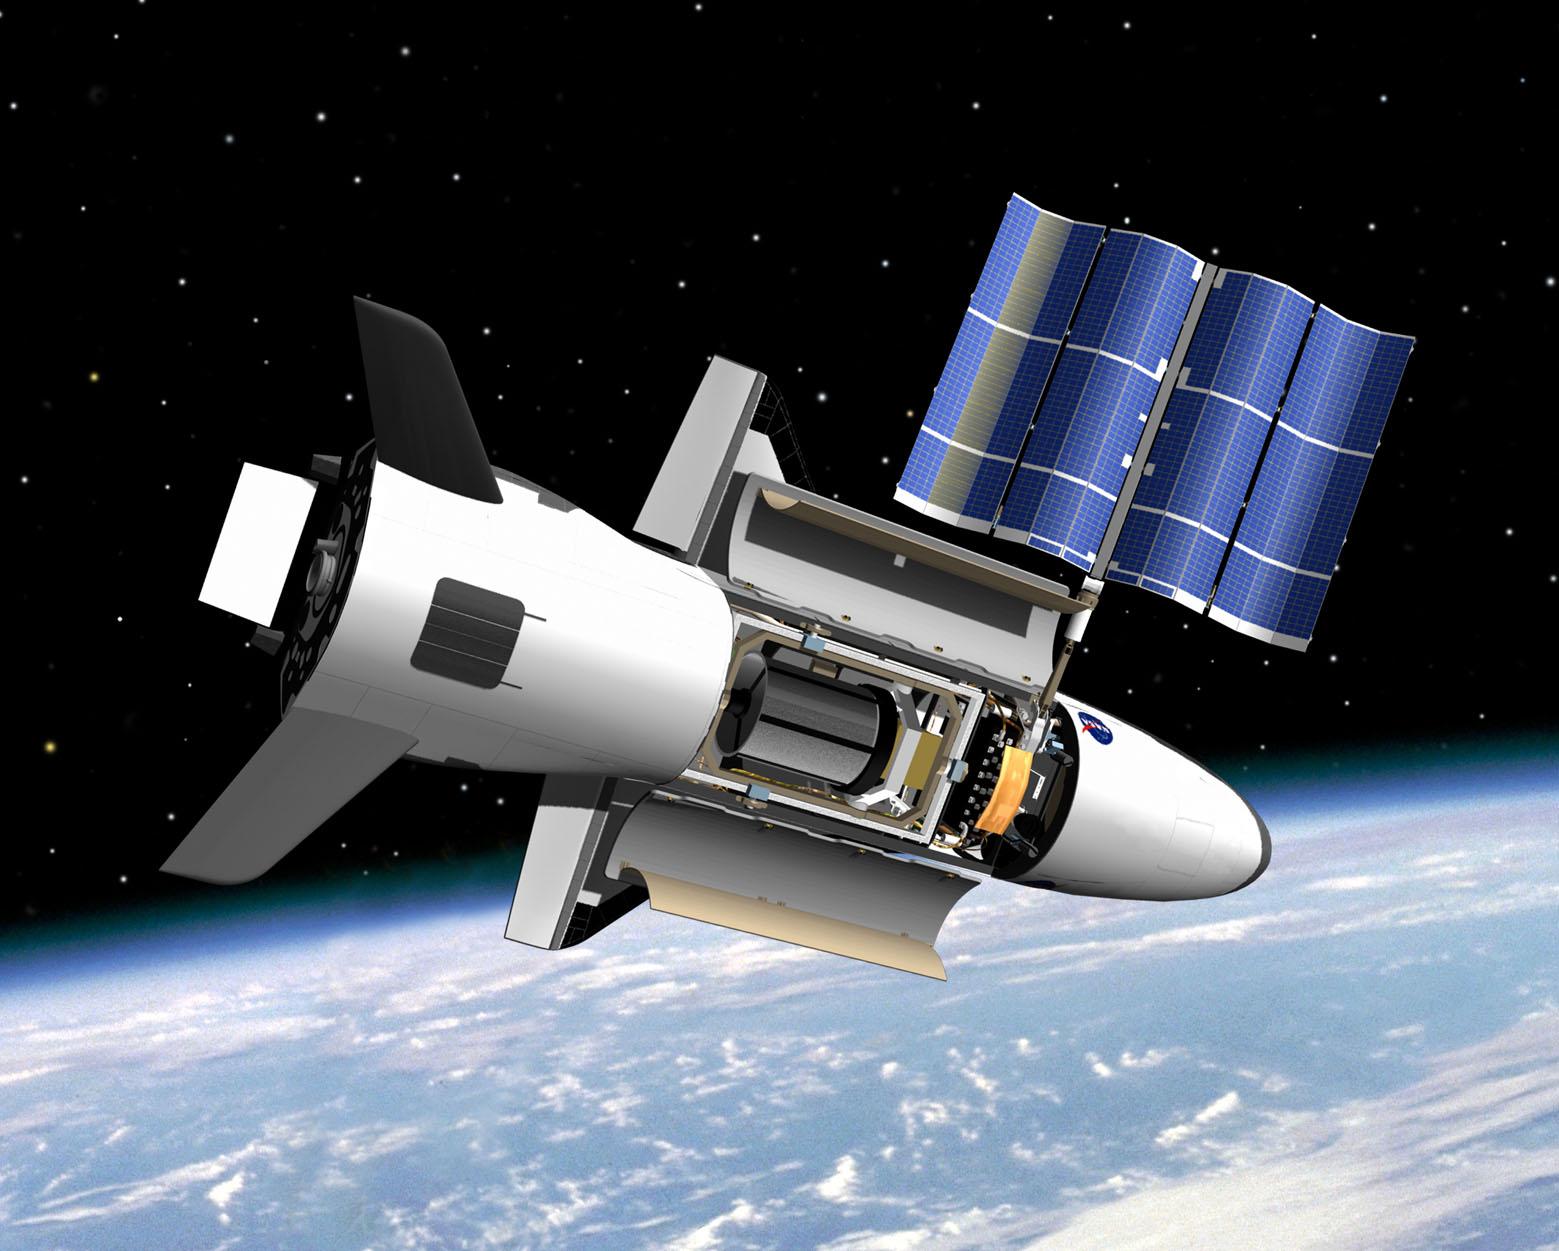 nasa mini space shuttle - photo #21